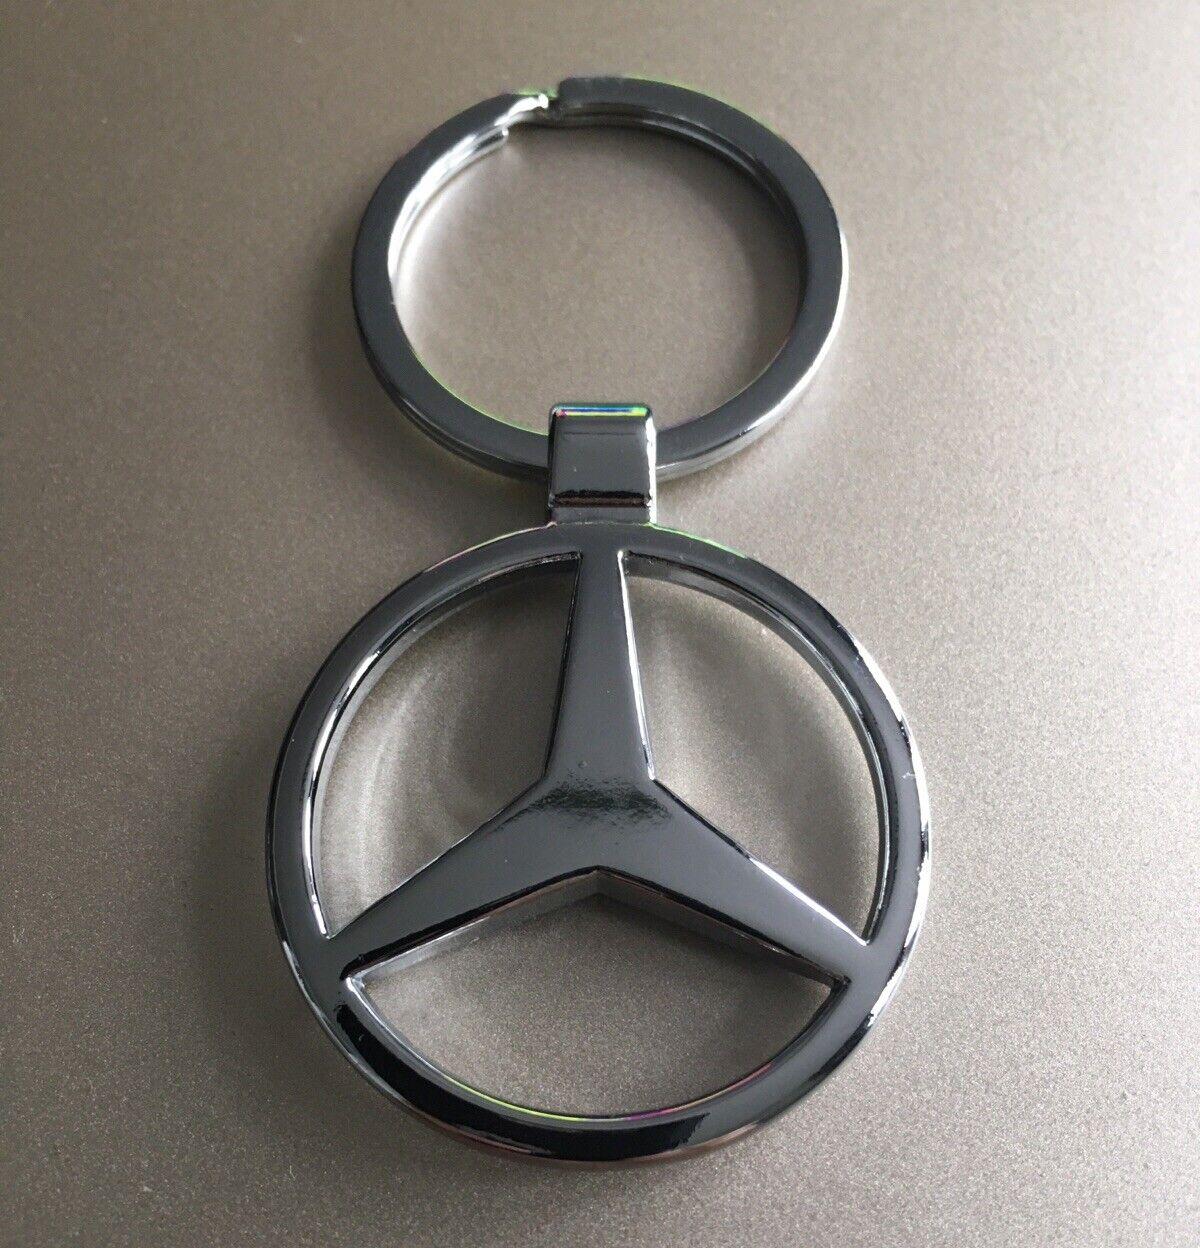 'MERCEDES BENZ' Keyring Chrome Keychain Official Logo Silver Key Ring Car Chain